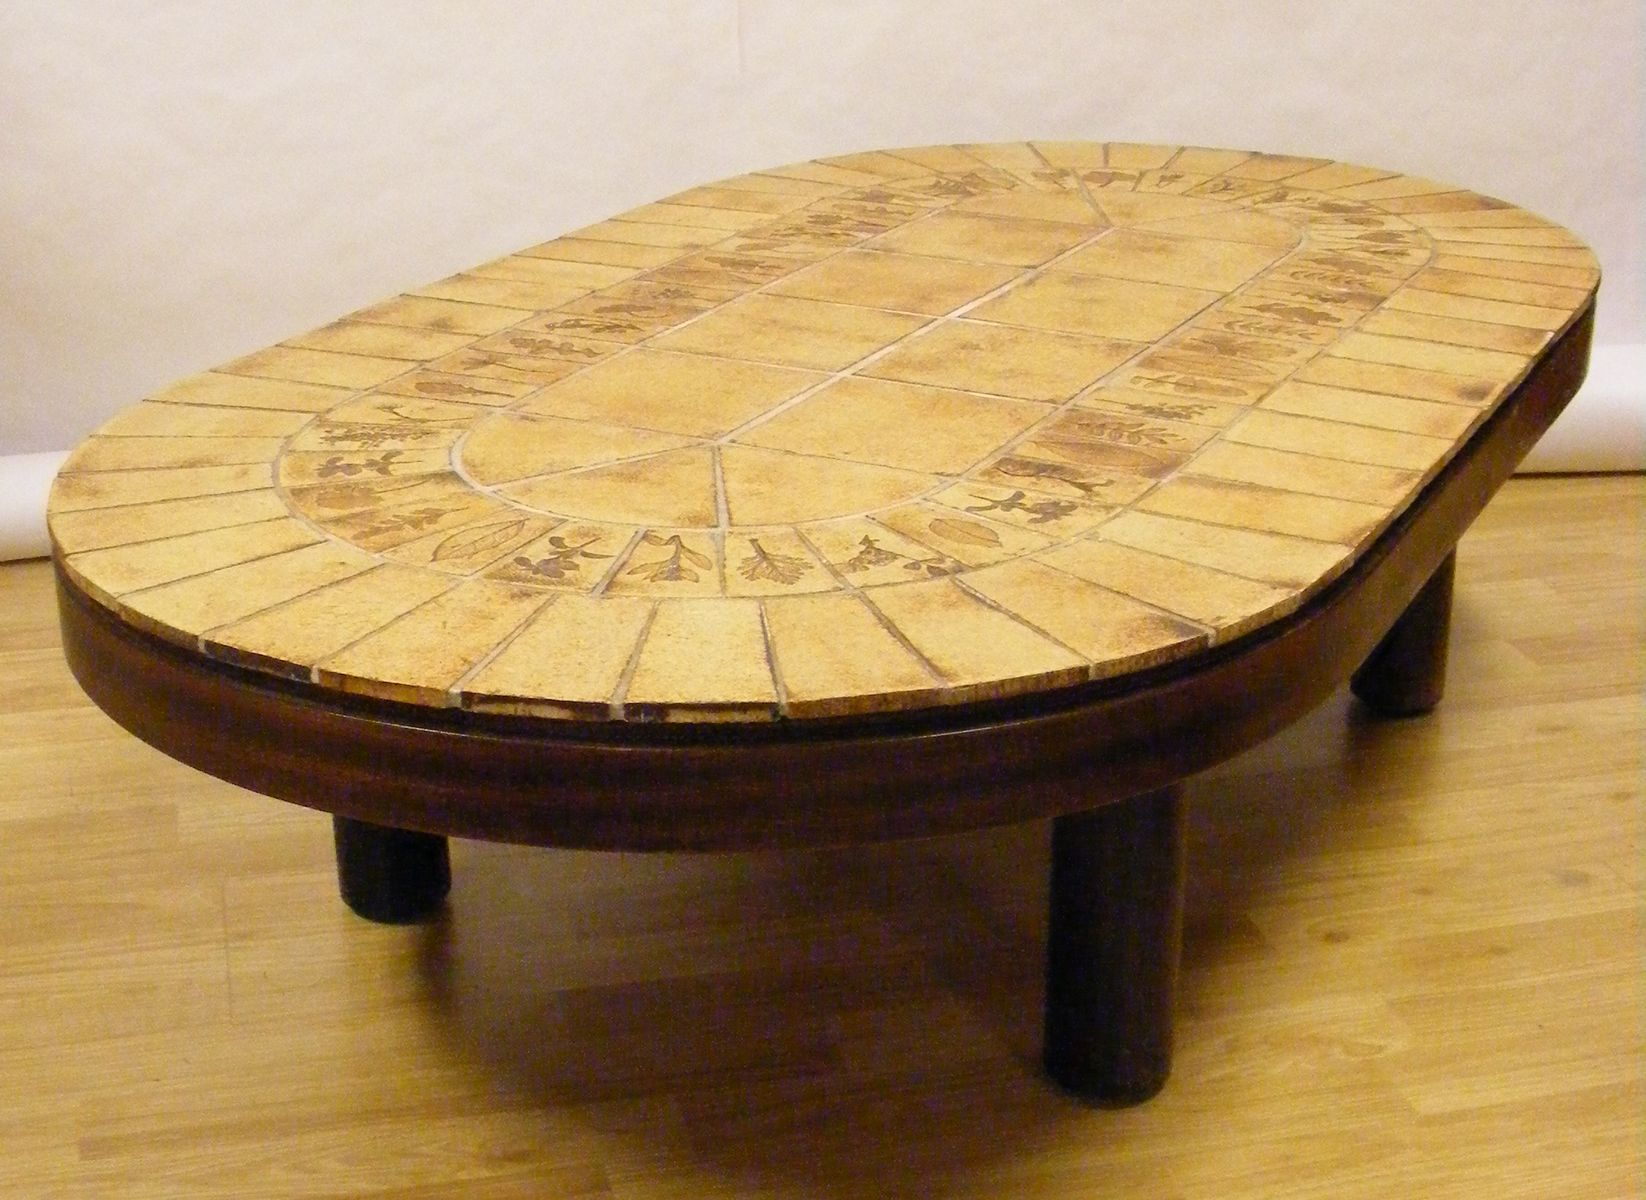 Table basse vintage ovale par roger capron 1960s en vente sur pamono - Table basse ovale vintage ...